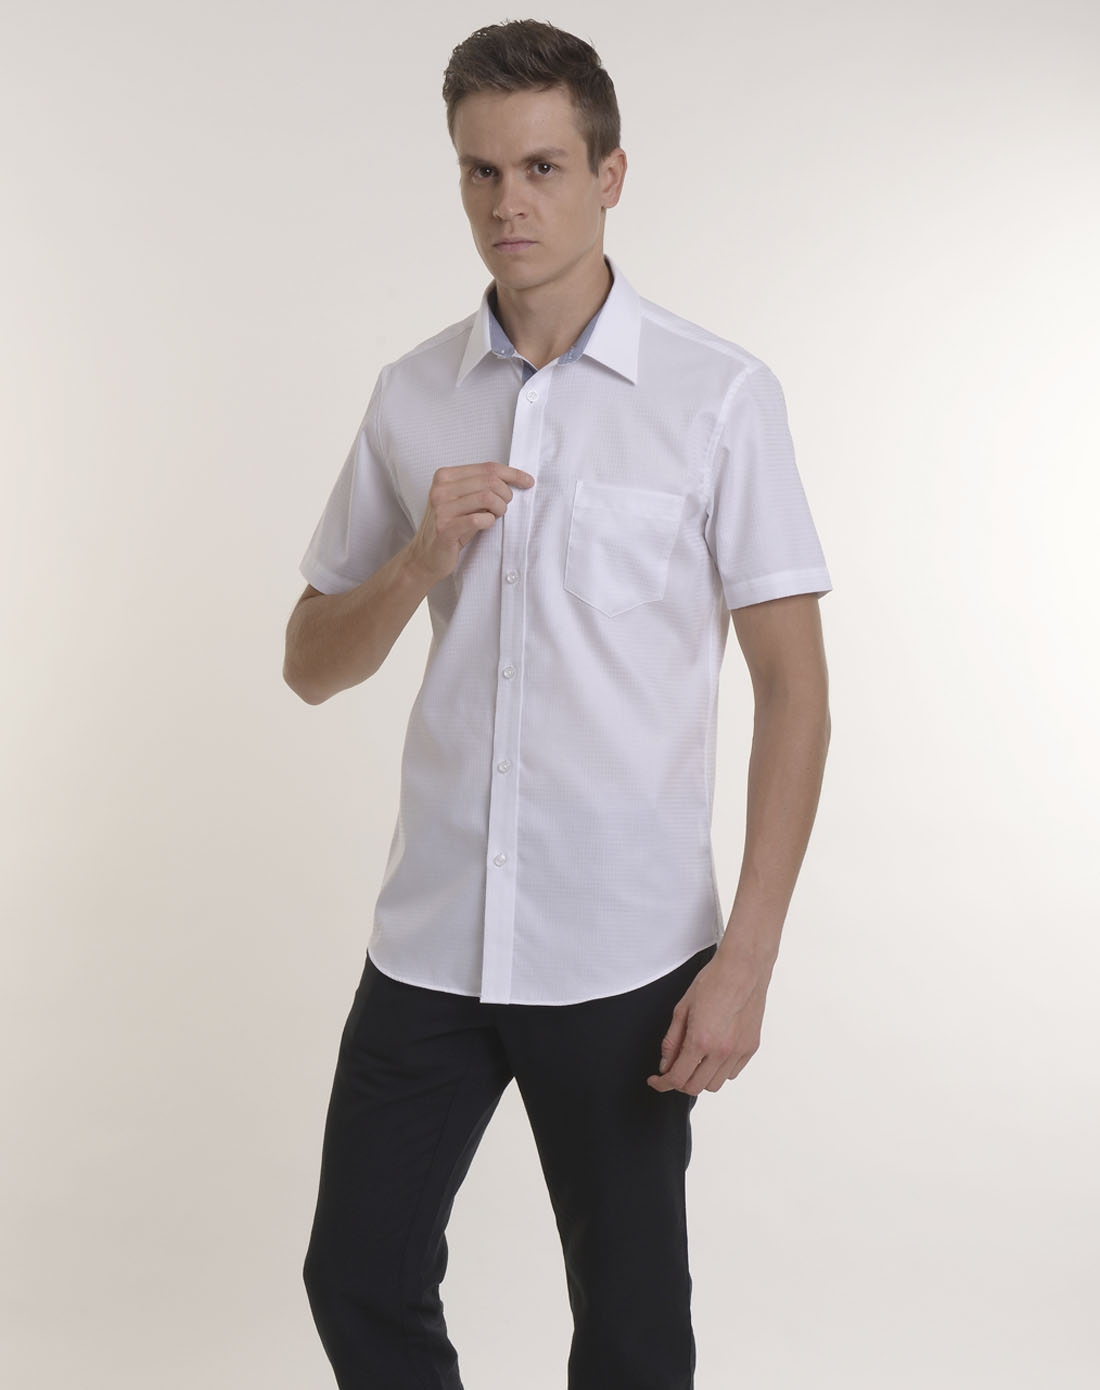 arrow男士纯白色短袖衬衫aw-38132001wh